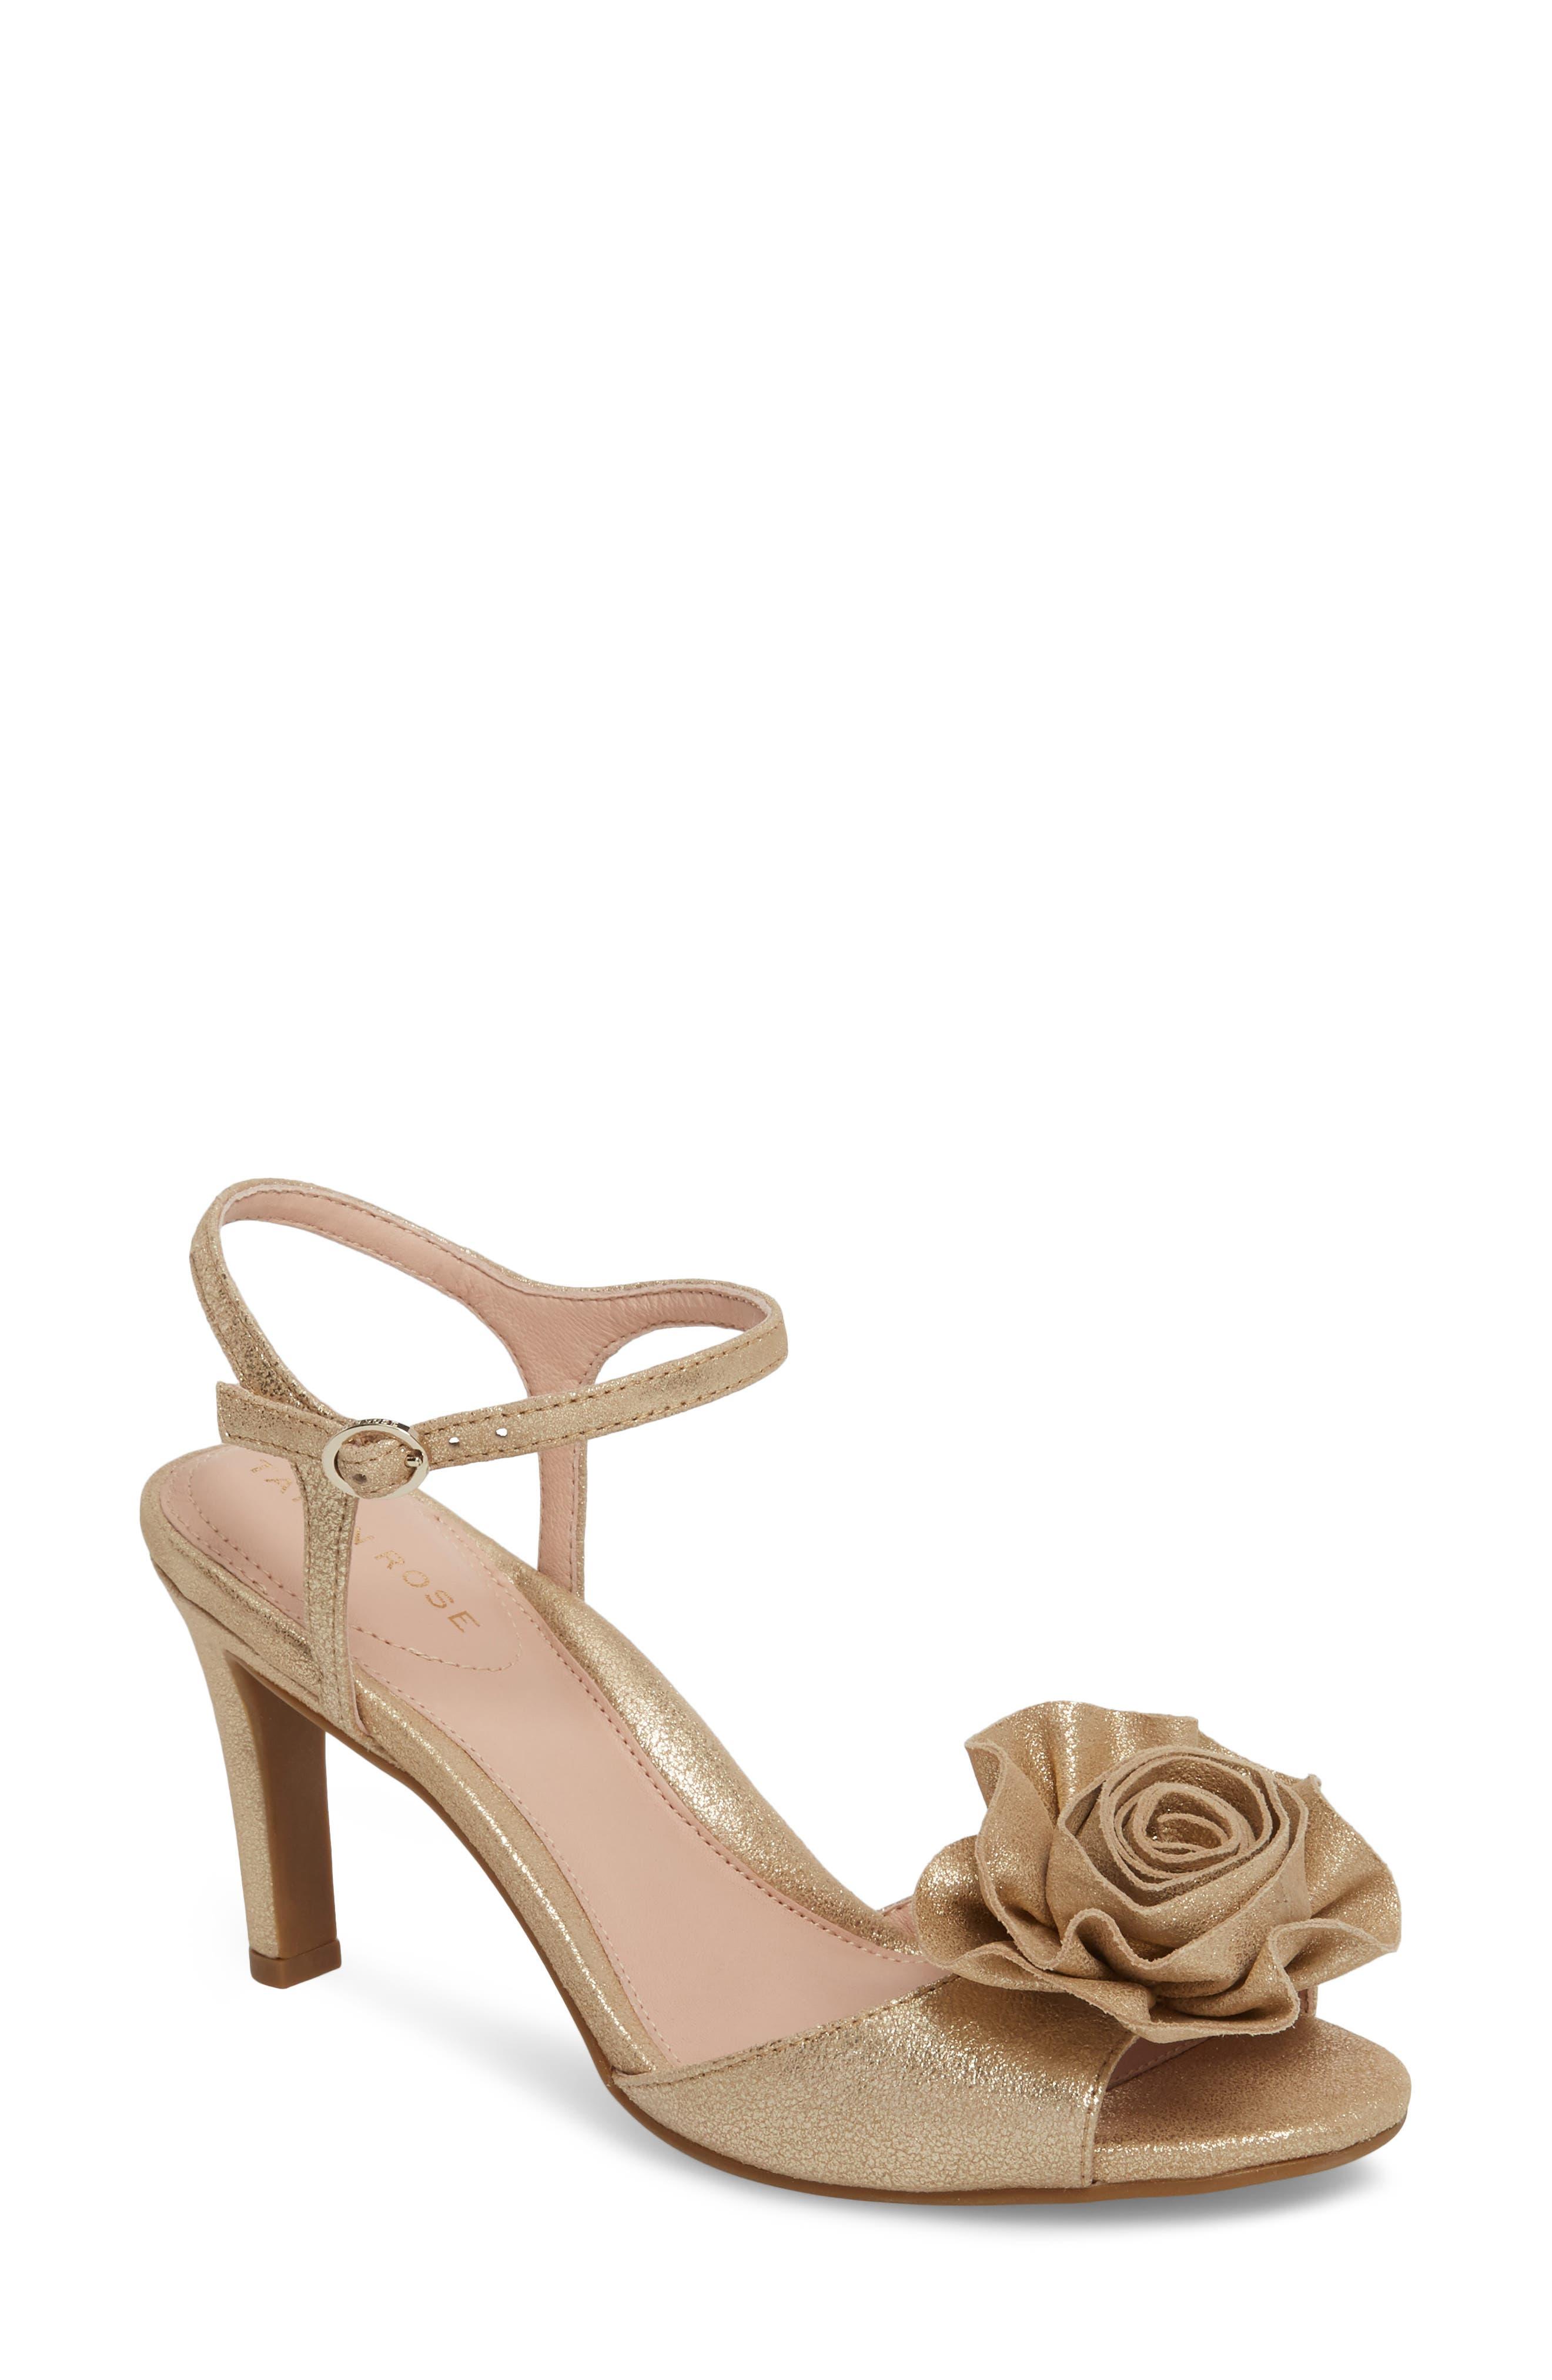 Taryn Rose Jacklyn Flower Sandal, Metallic